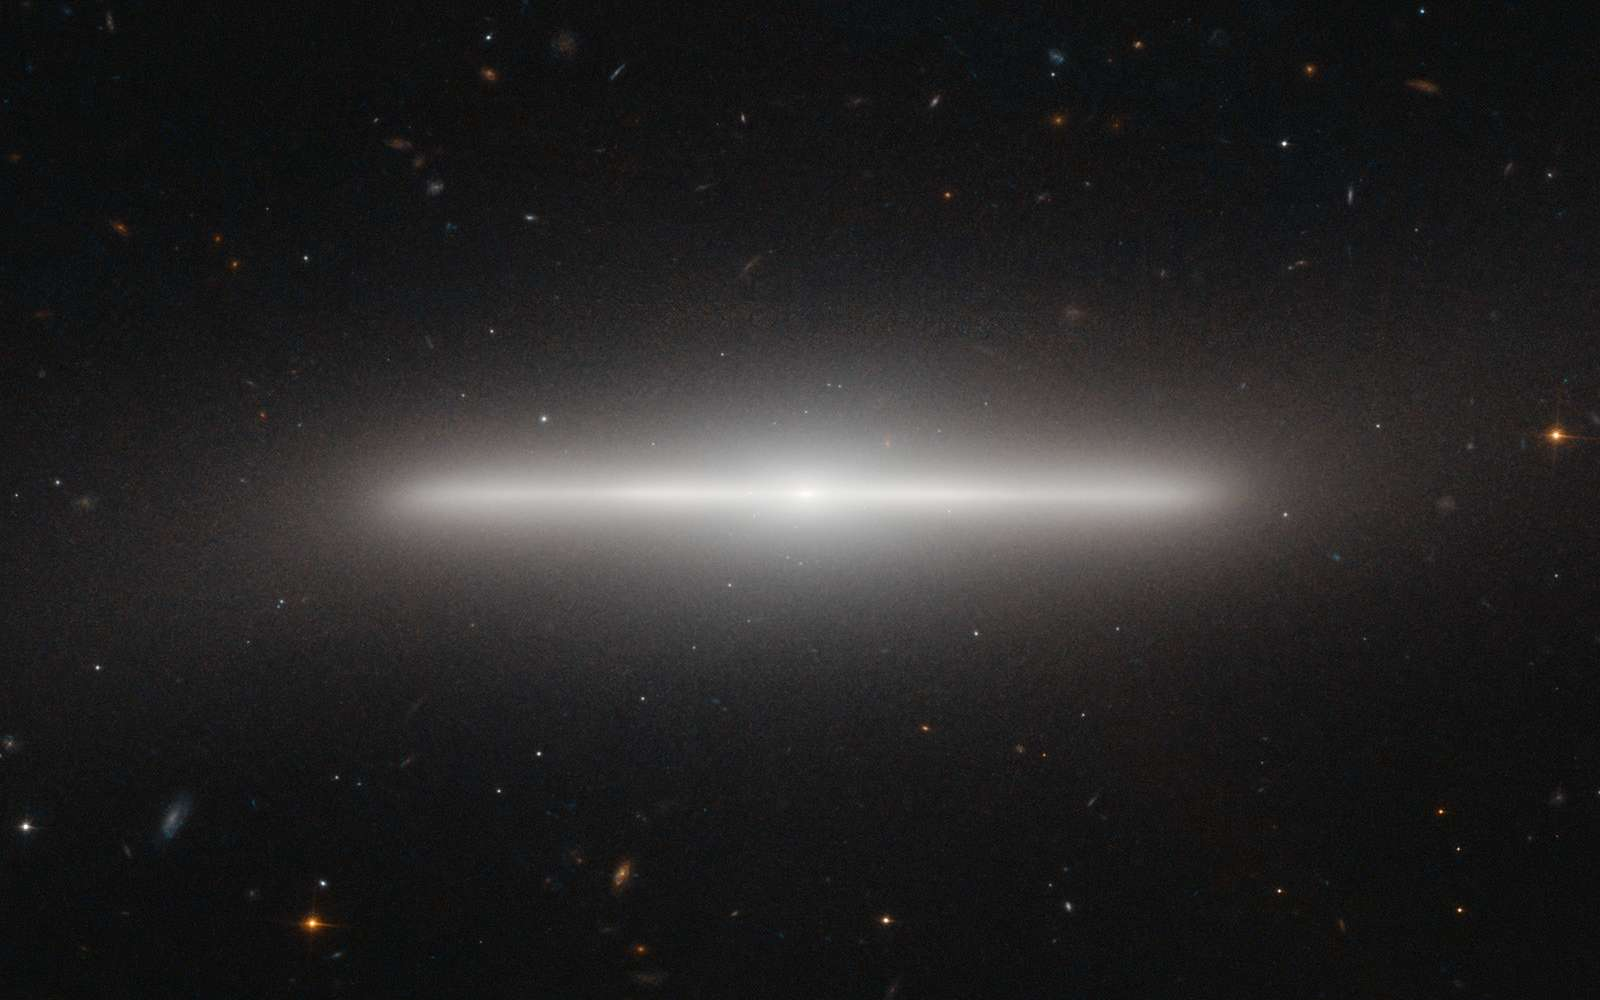 NGC 4452, une galaxie de la constellation de la Vierge qui se présente par la tranche. © Esa/Nasa